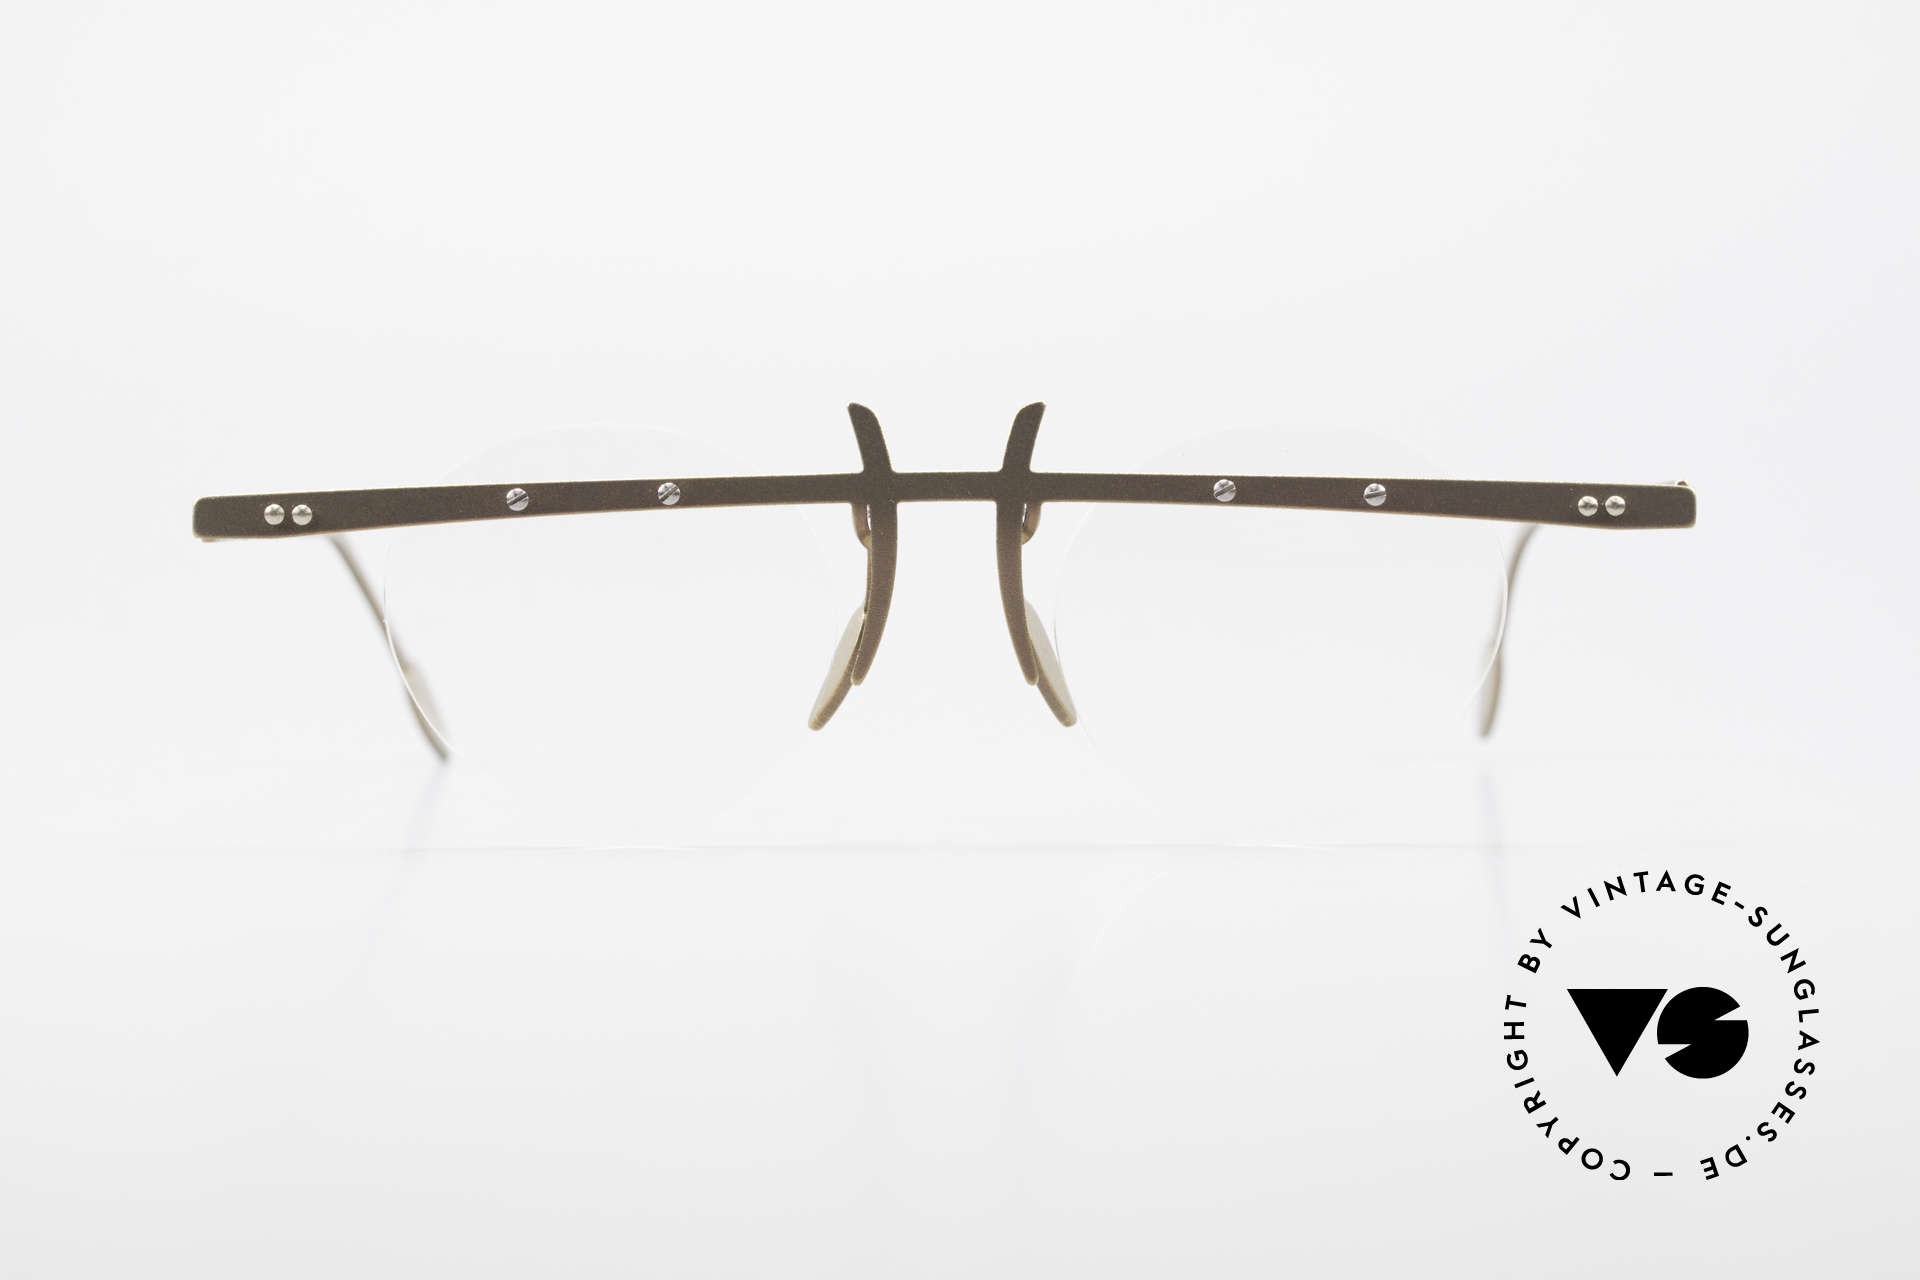 Theo Belgium Tita VI 9 Vintage Eyeglasses Titanium, founded in 1989 as 'anti mainstream' eyewear / glasses, Made for Men and Women